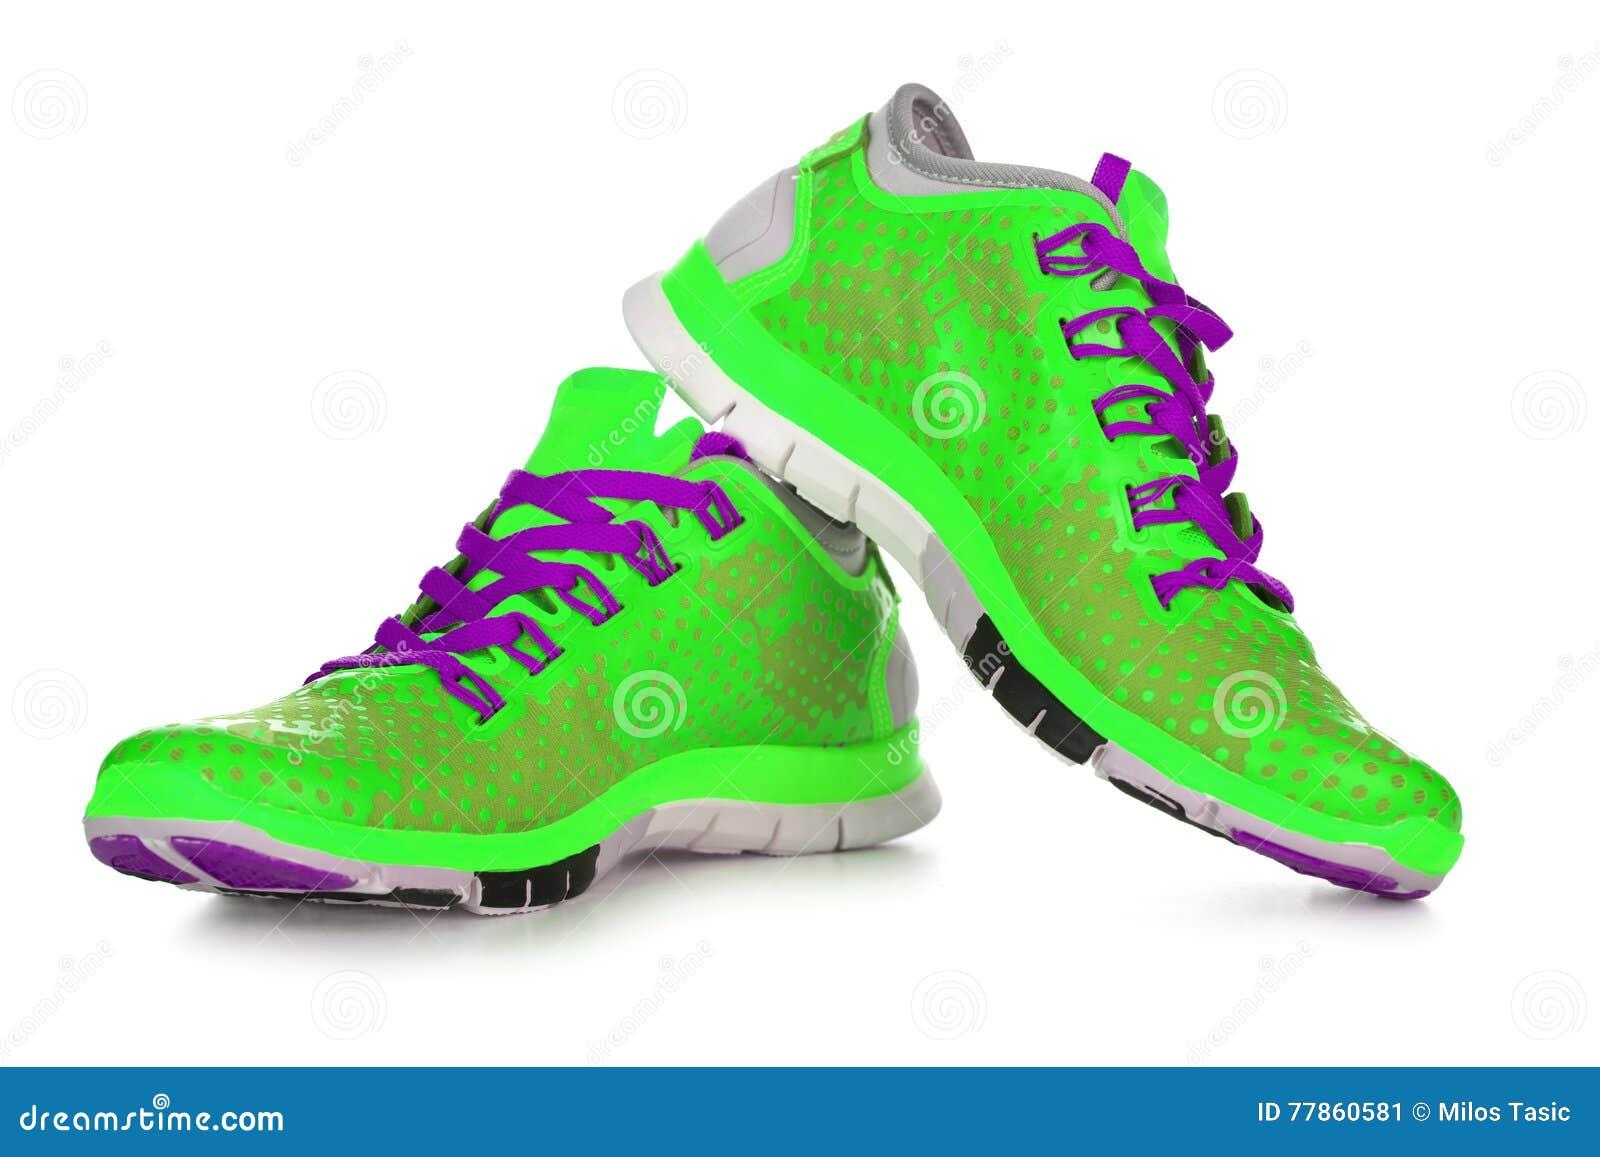 5c13b4c72d0 Κίτρινα αθλητικά παπούτσια στοκ εικόνα. εικόνα από ύφος - 77860581